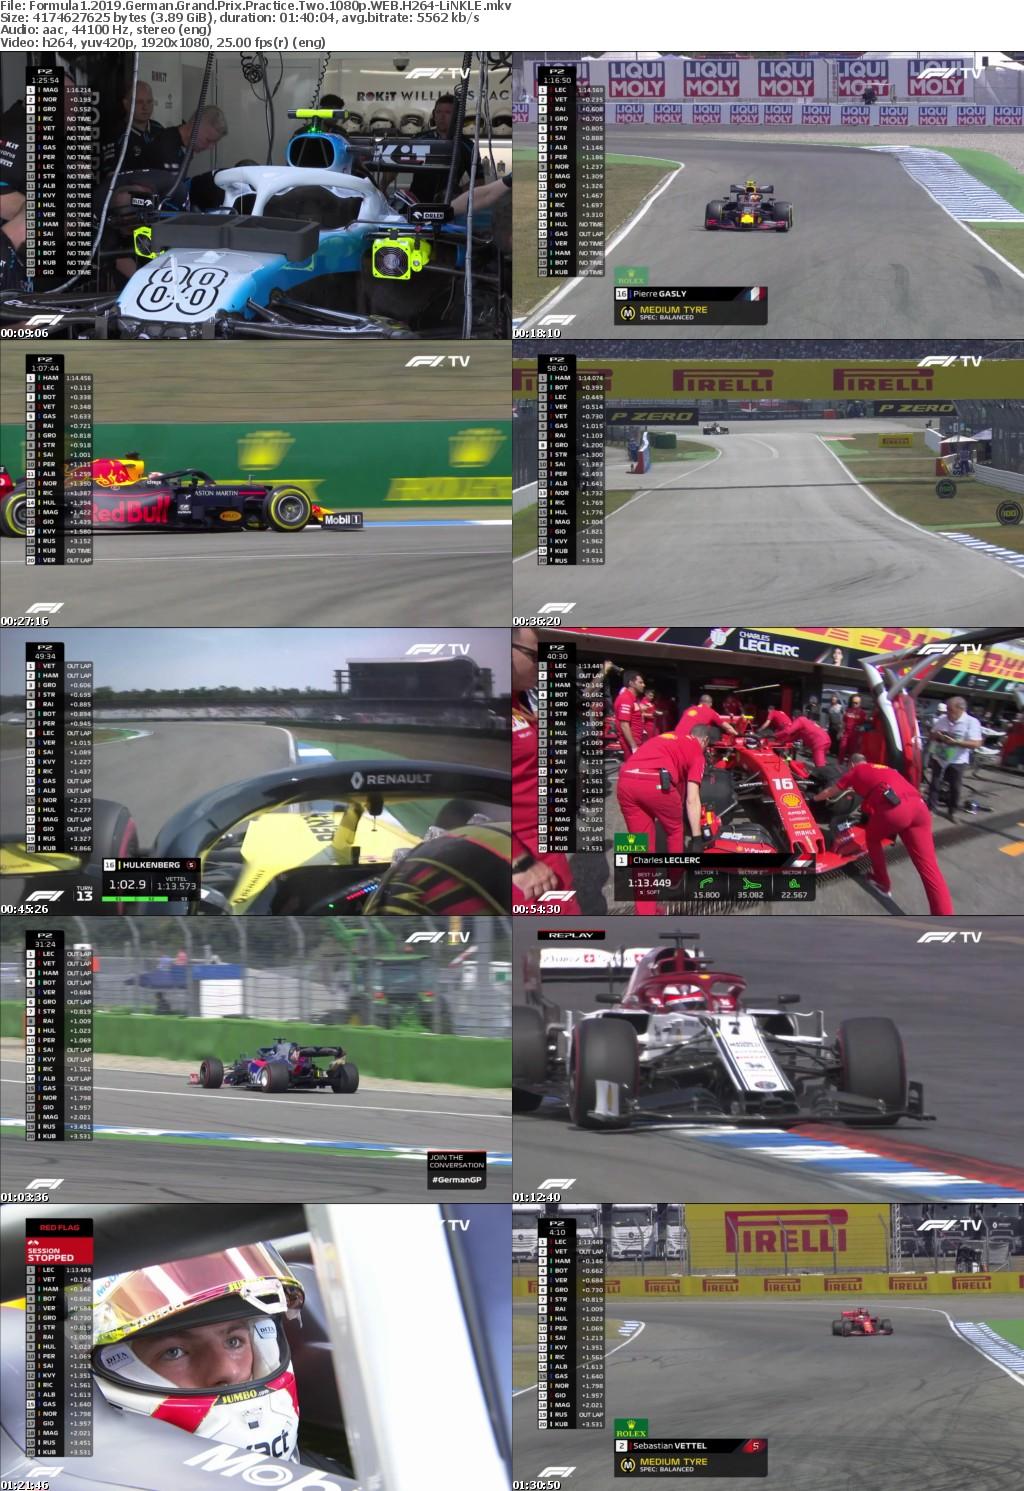 Formula1 2019 German Grand Prix Practice Two 1080p WEB H264-LiNKLE